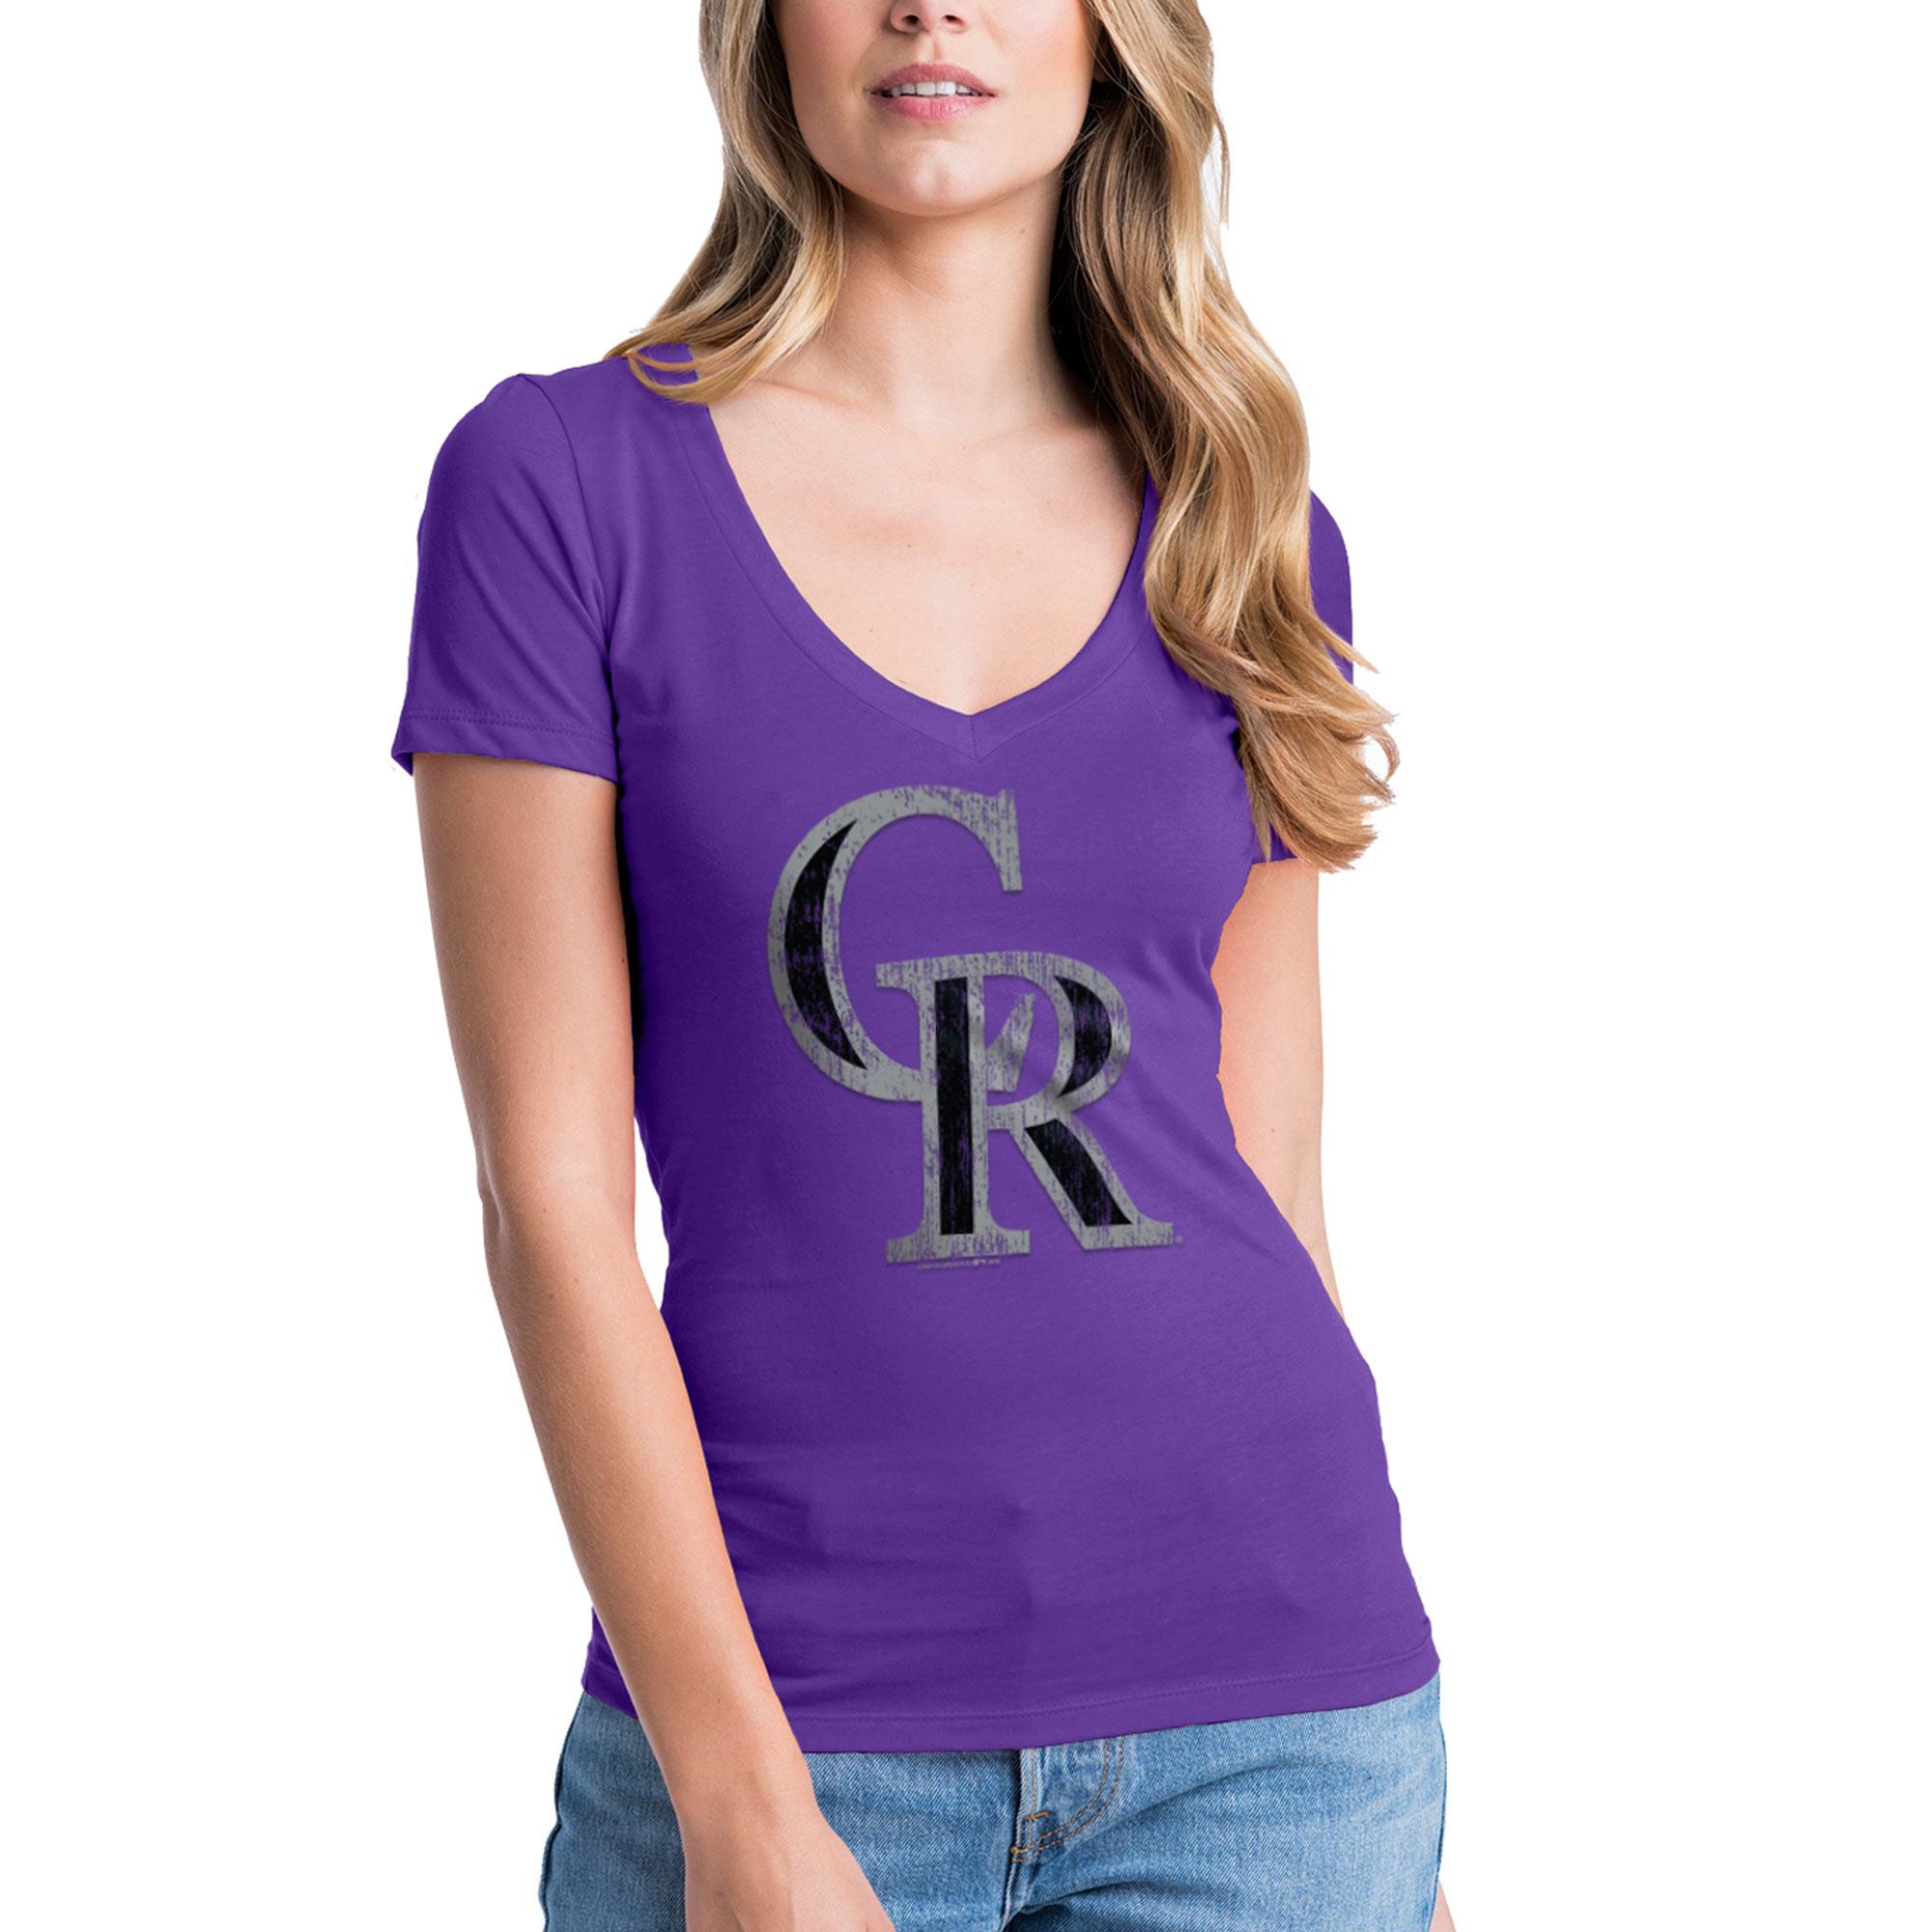 Colorado Rockies New Era Women's V-Neck T-Shirt - Purple